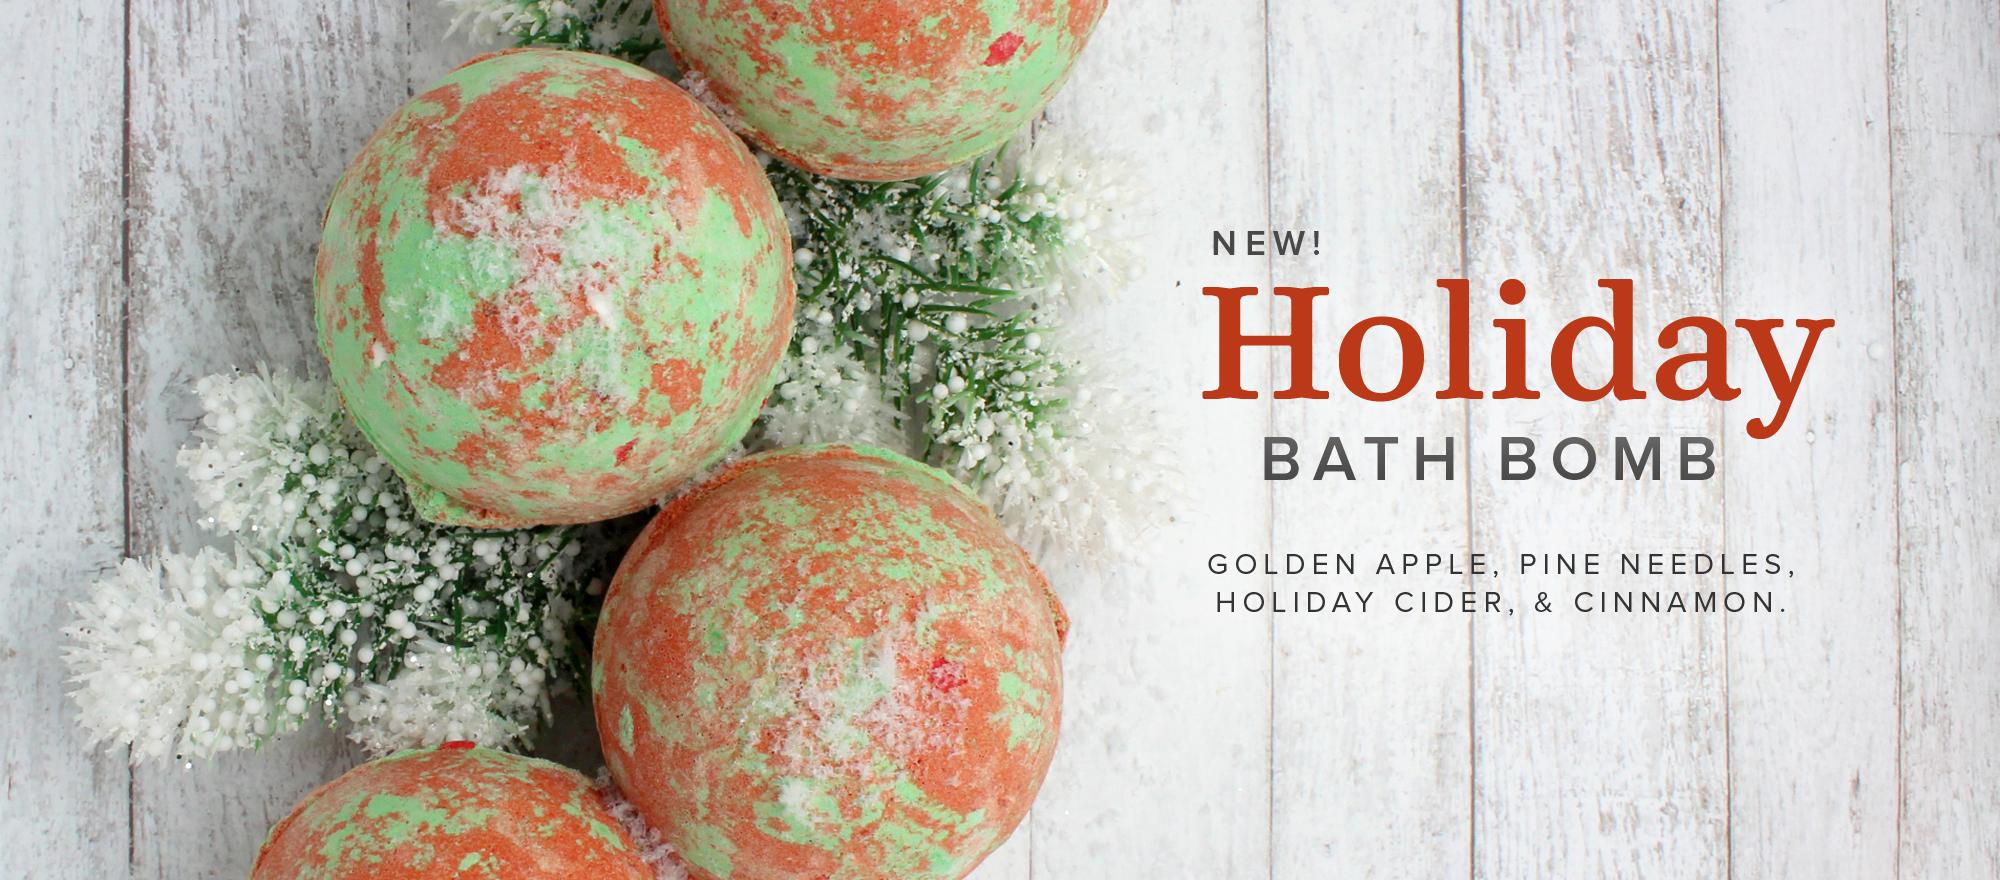 Holiday Bath Bomb